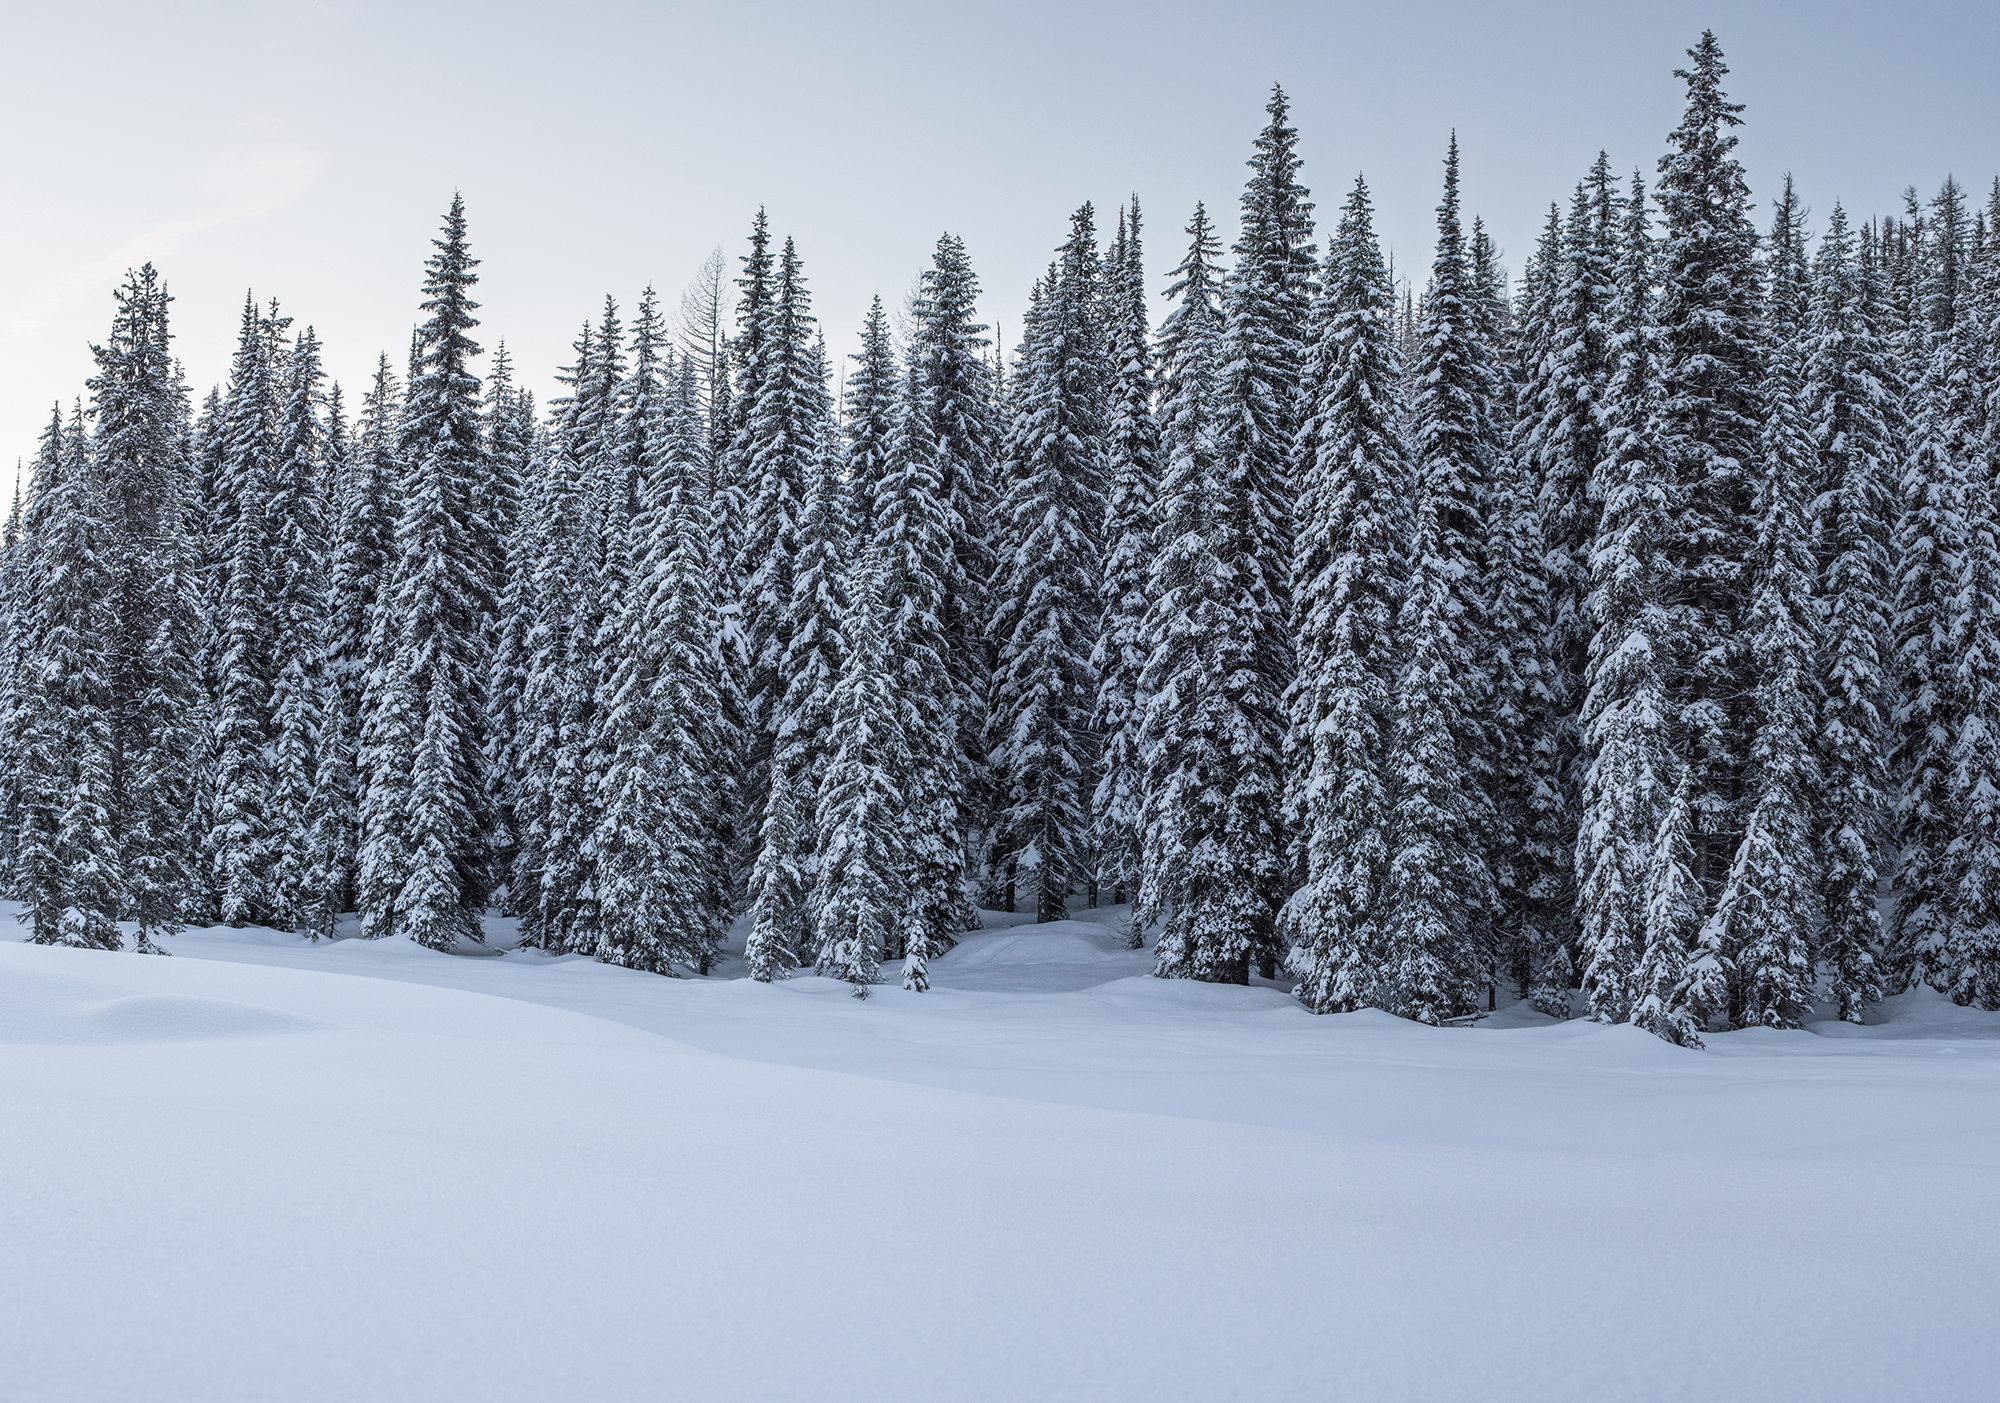 lolo pass snowy trees